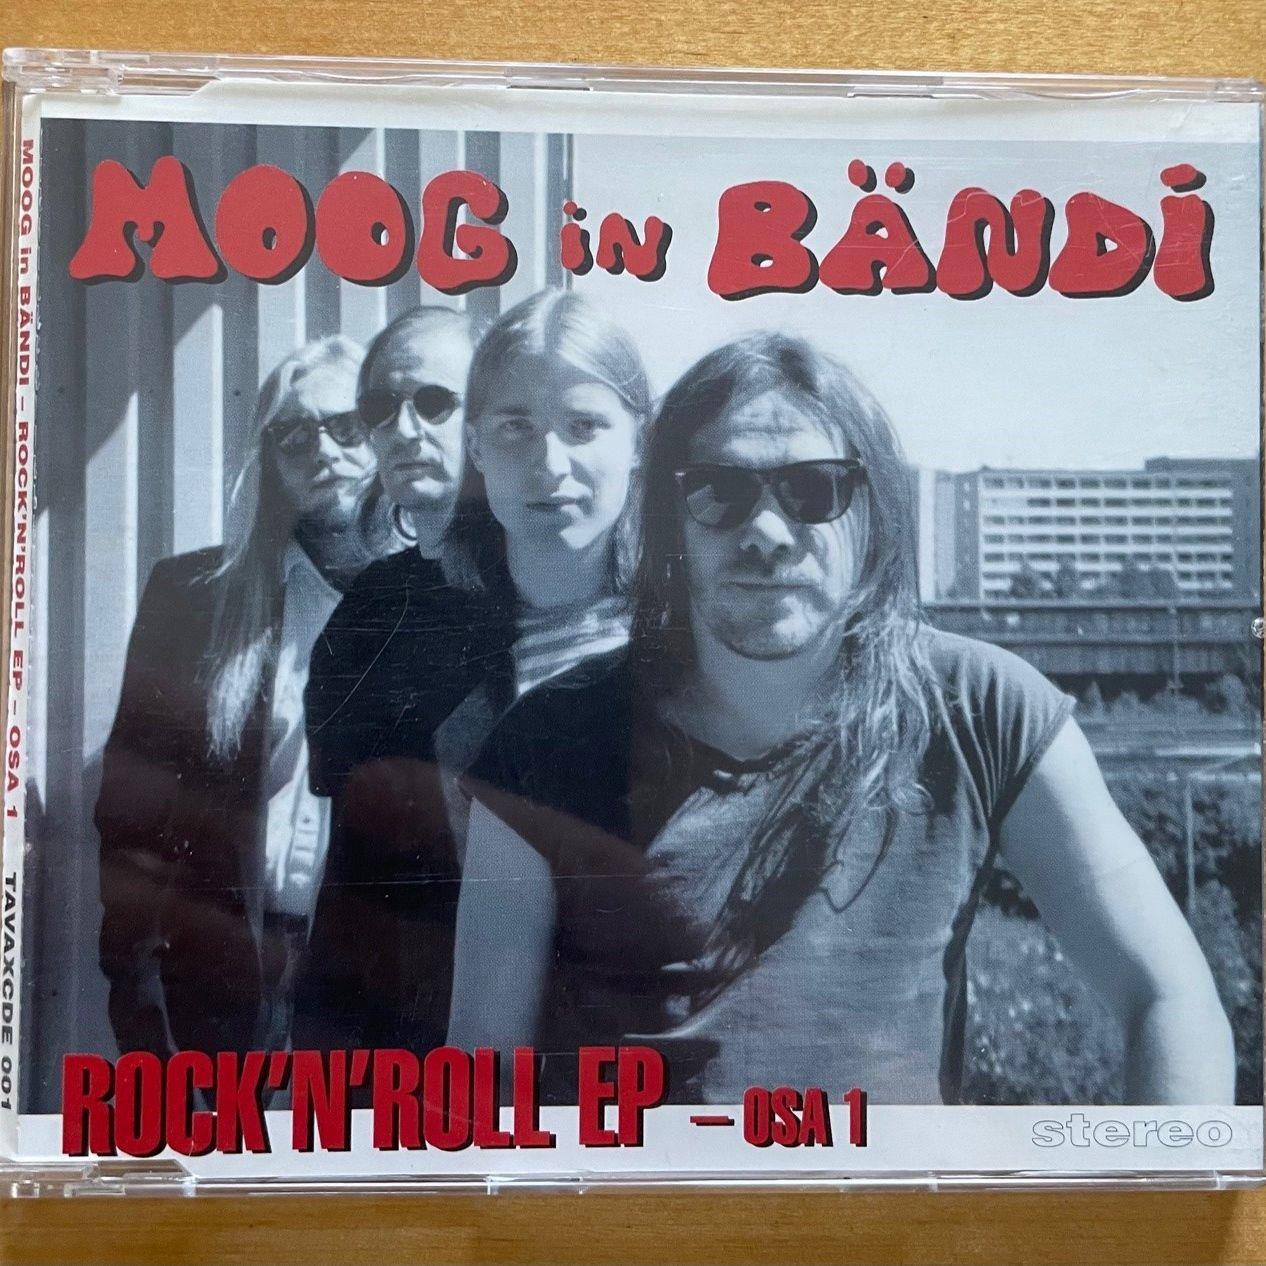 MOOG in BÄNDI Rock'n'roll EP - osa 1 LP undefined